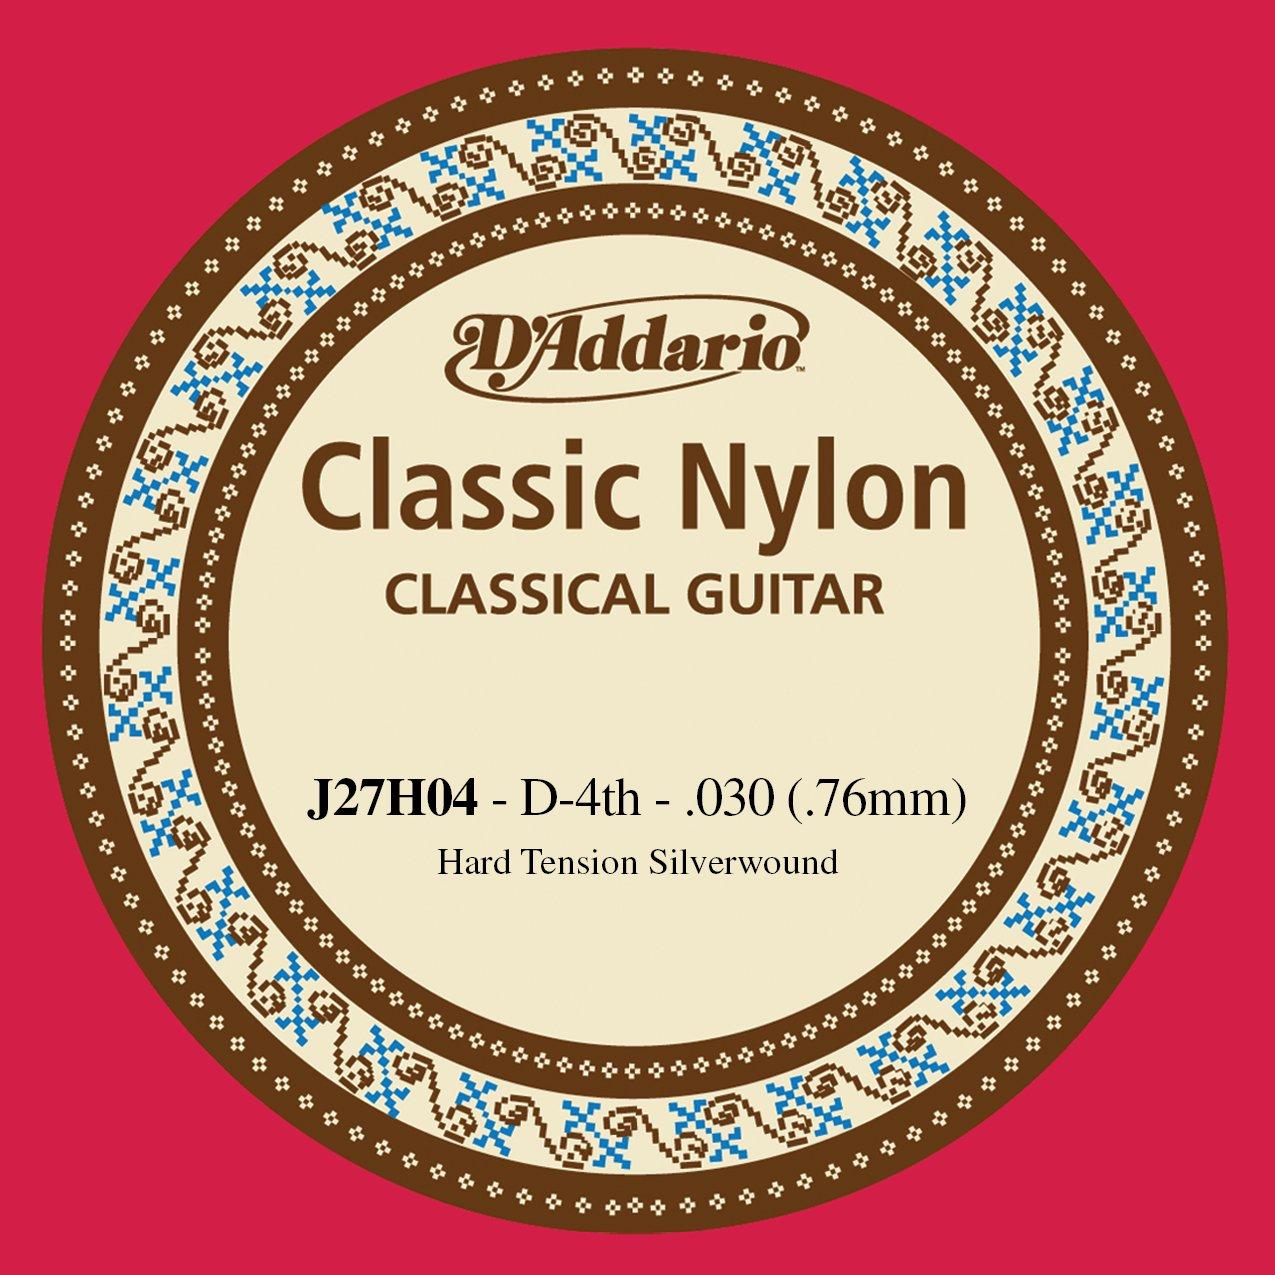 D'Addario J27H04  Student Nylon Classical Guitar Single String, Hard Tension, Fourth String